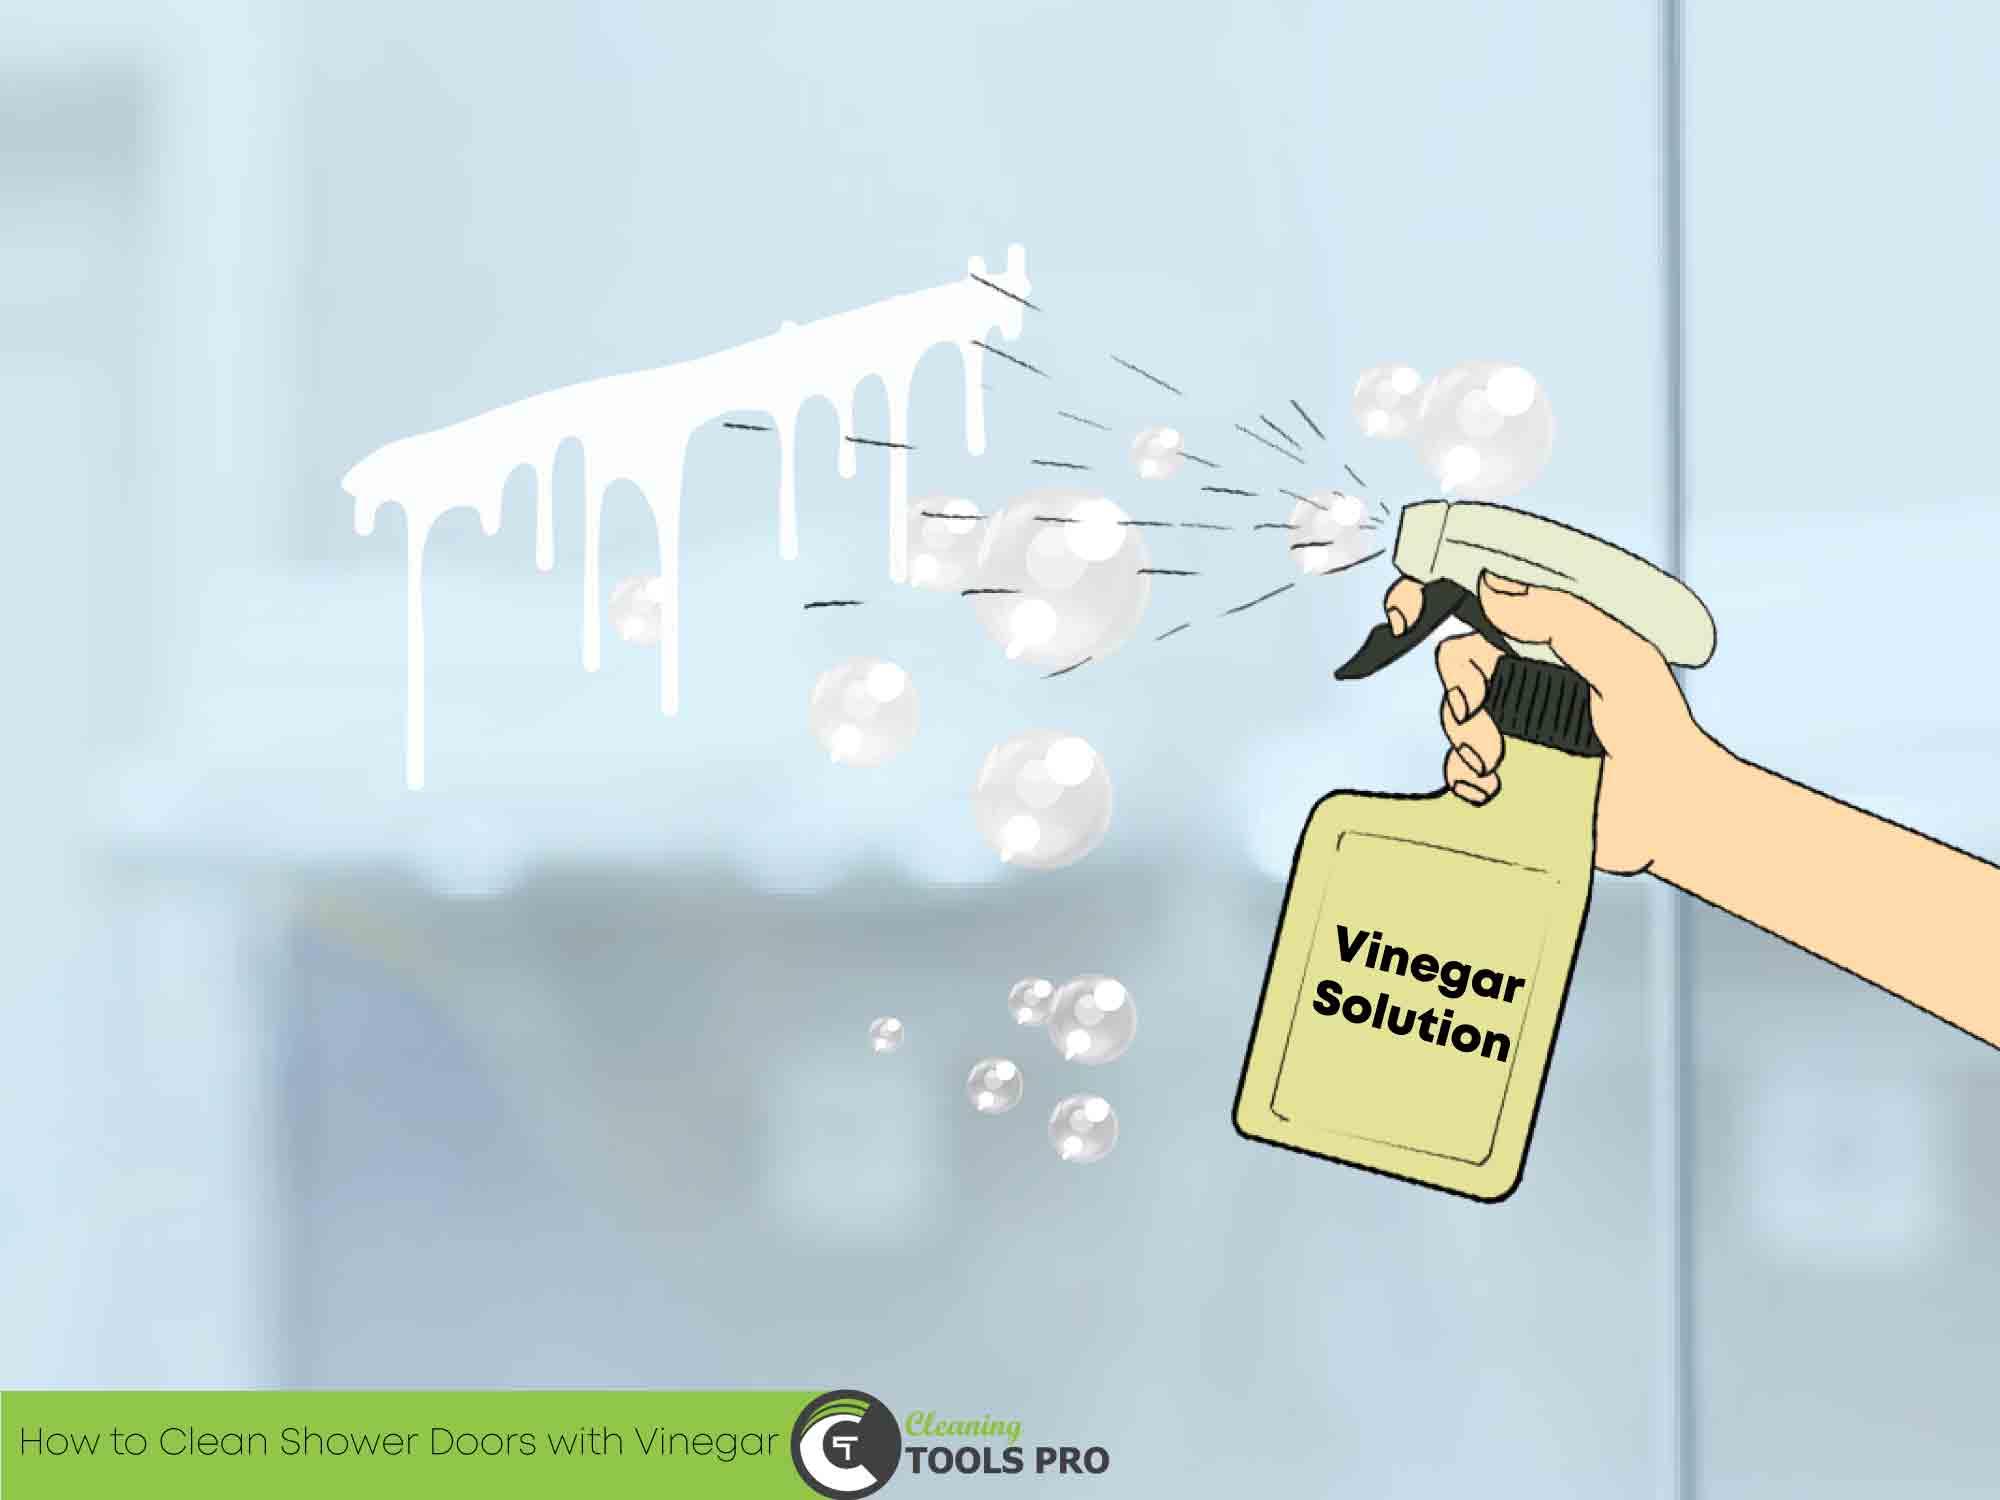 Spraying-vinegar-solution-in-shower-door